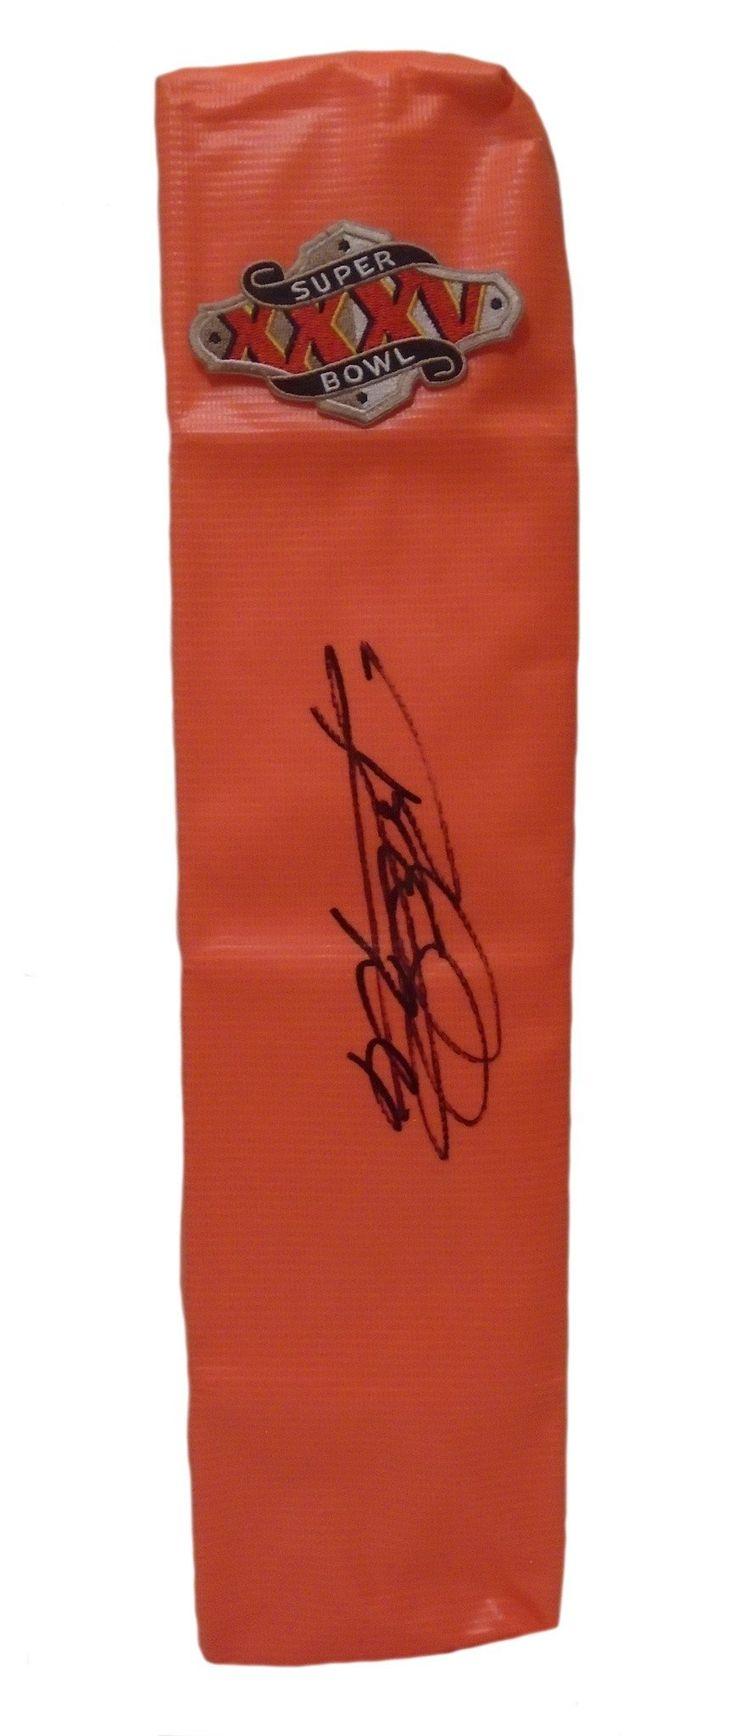 Rod Woodson Autographed Baltimore Ravens Fullsize Football End Zone Touchdown Pylon, Proof